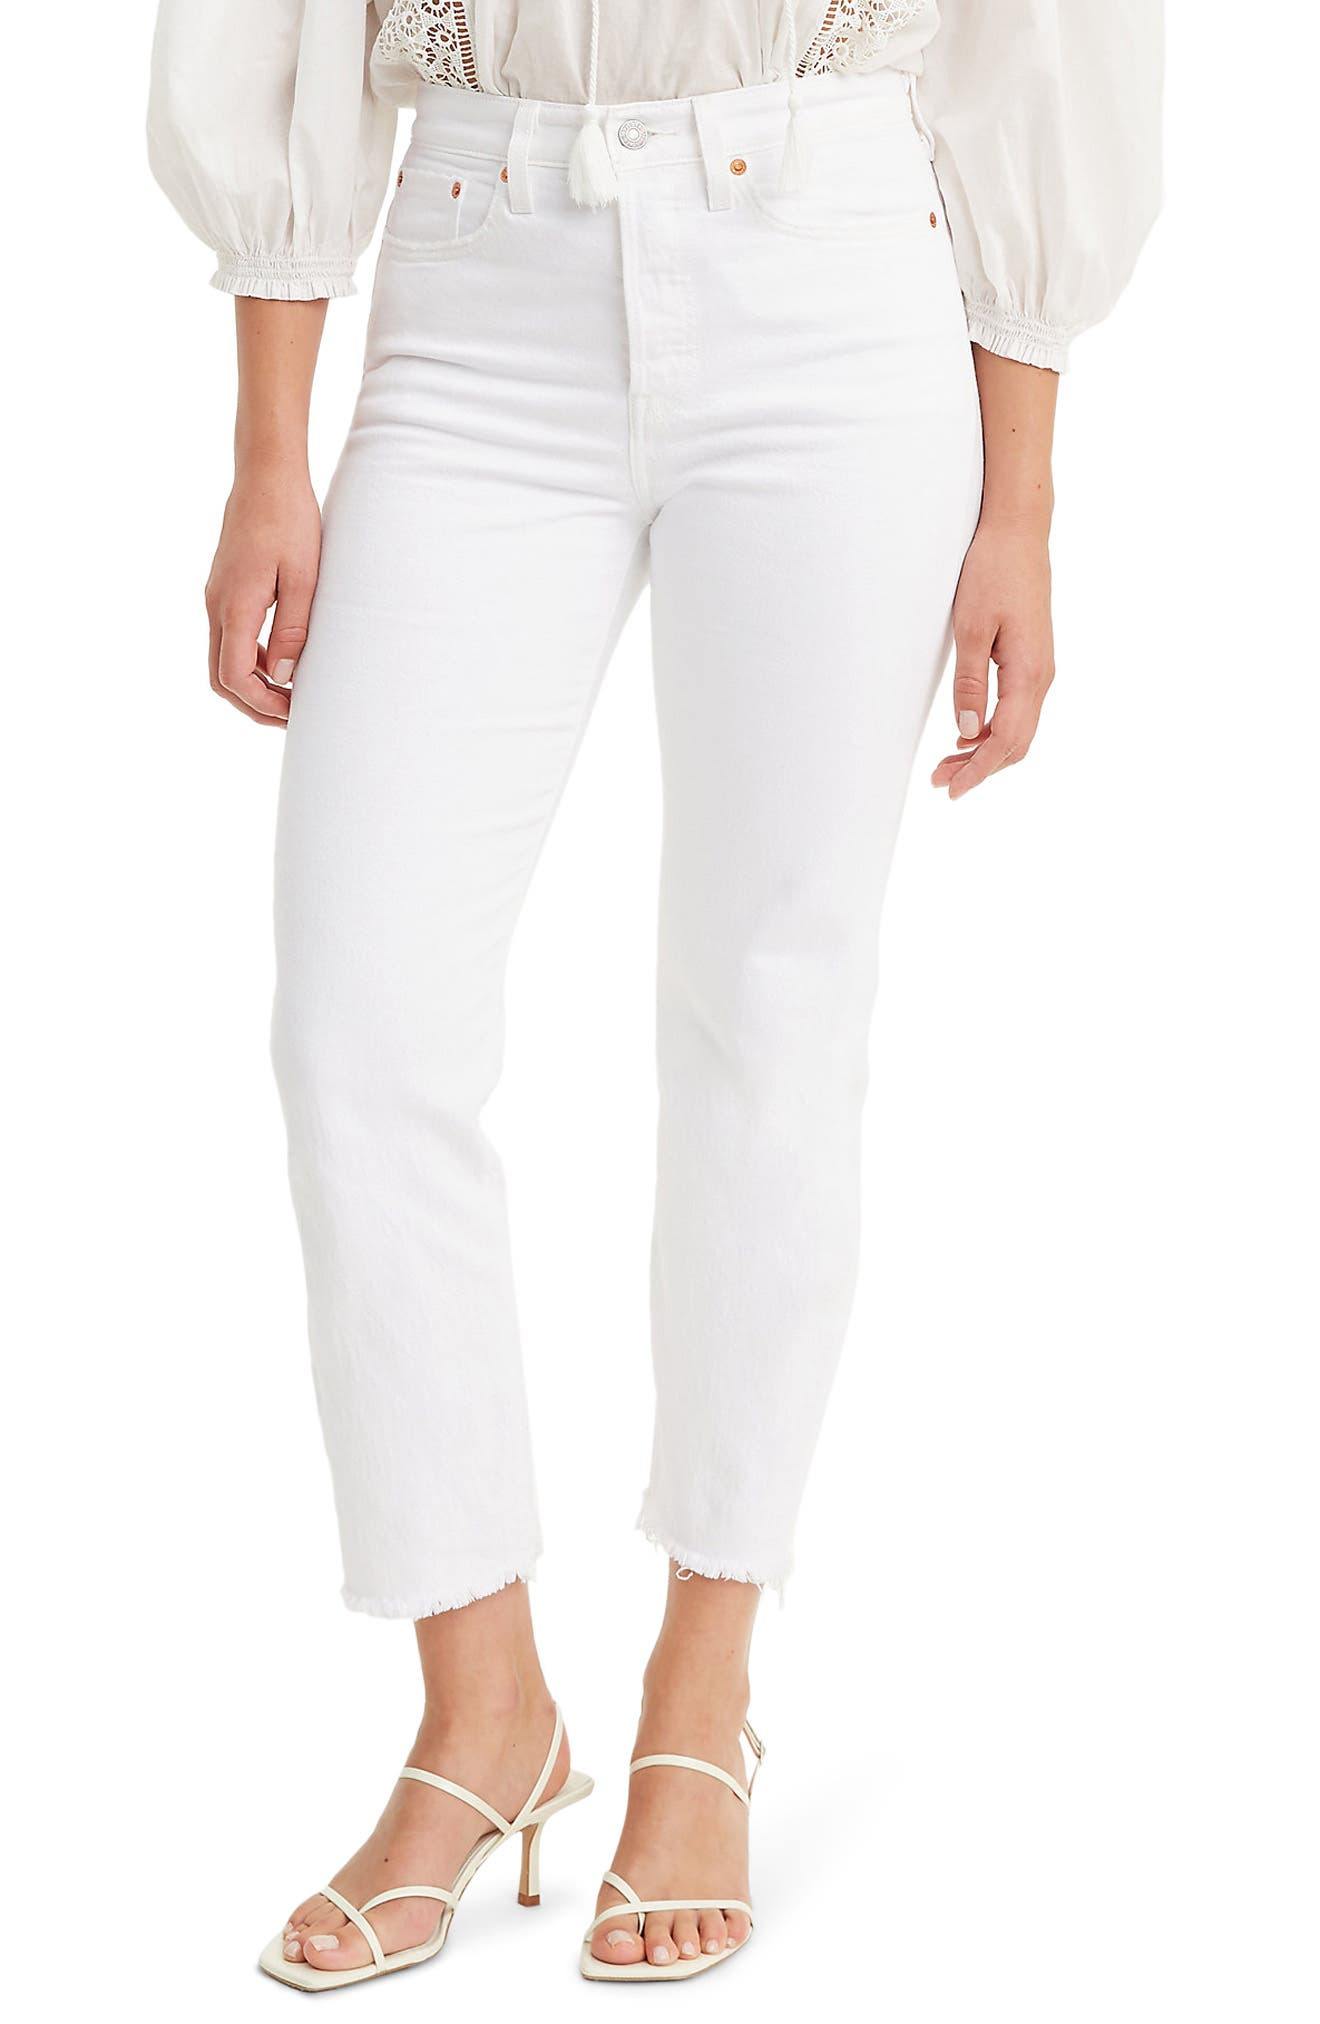 Women's Levi's Wedgie High Waist Raw Hem Crop Straight Leg Jeans,  23 x 26 - White